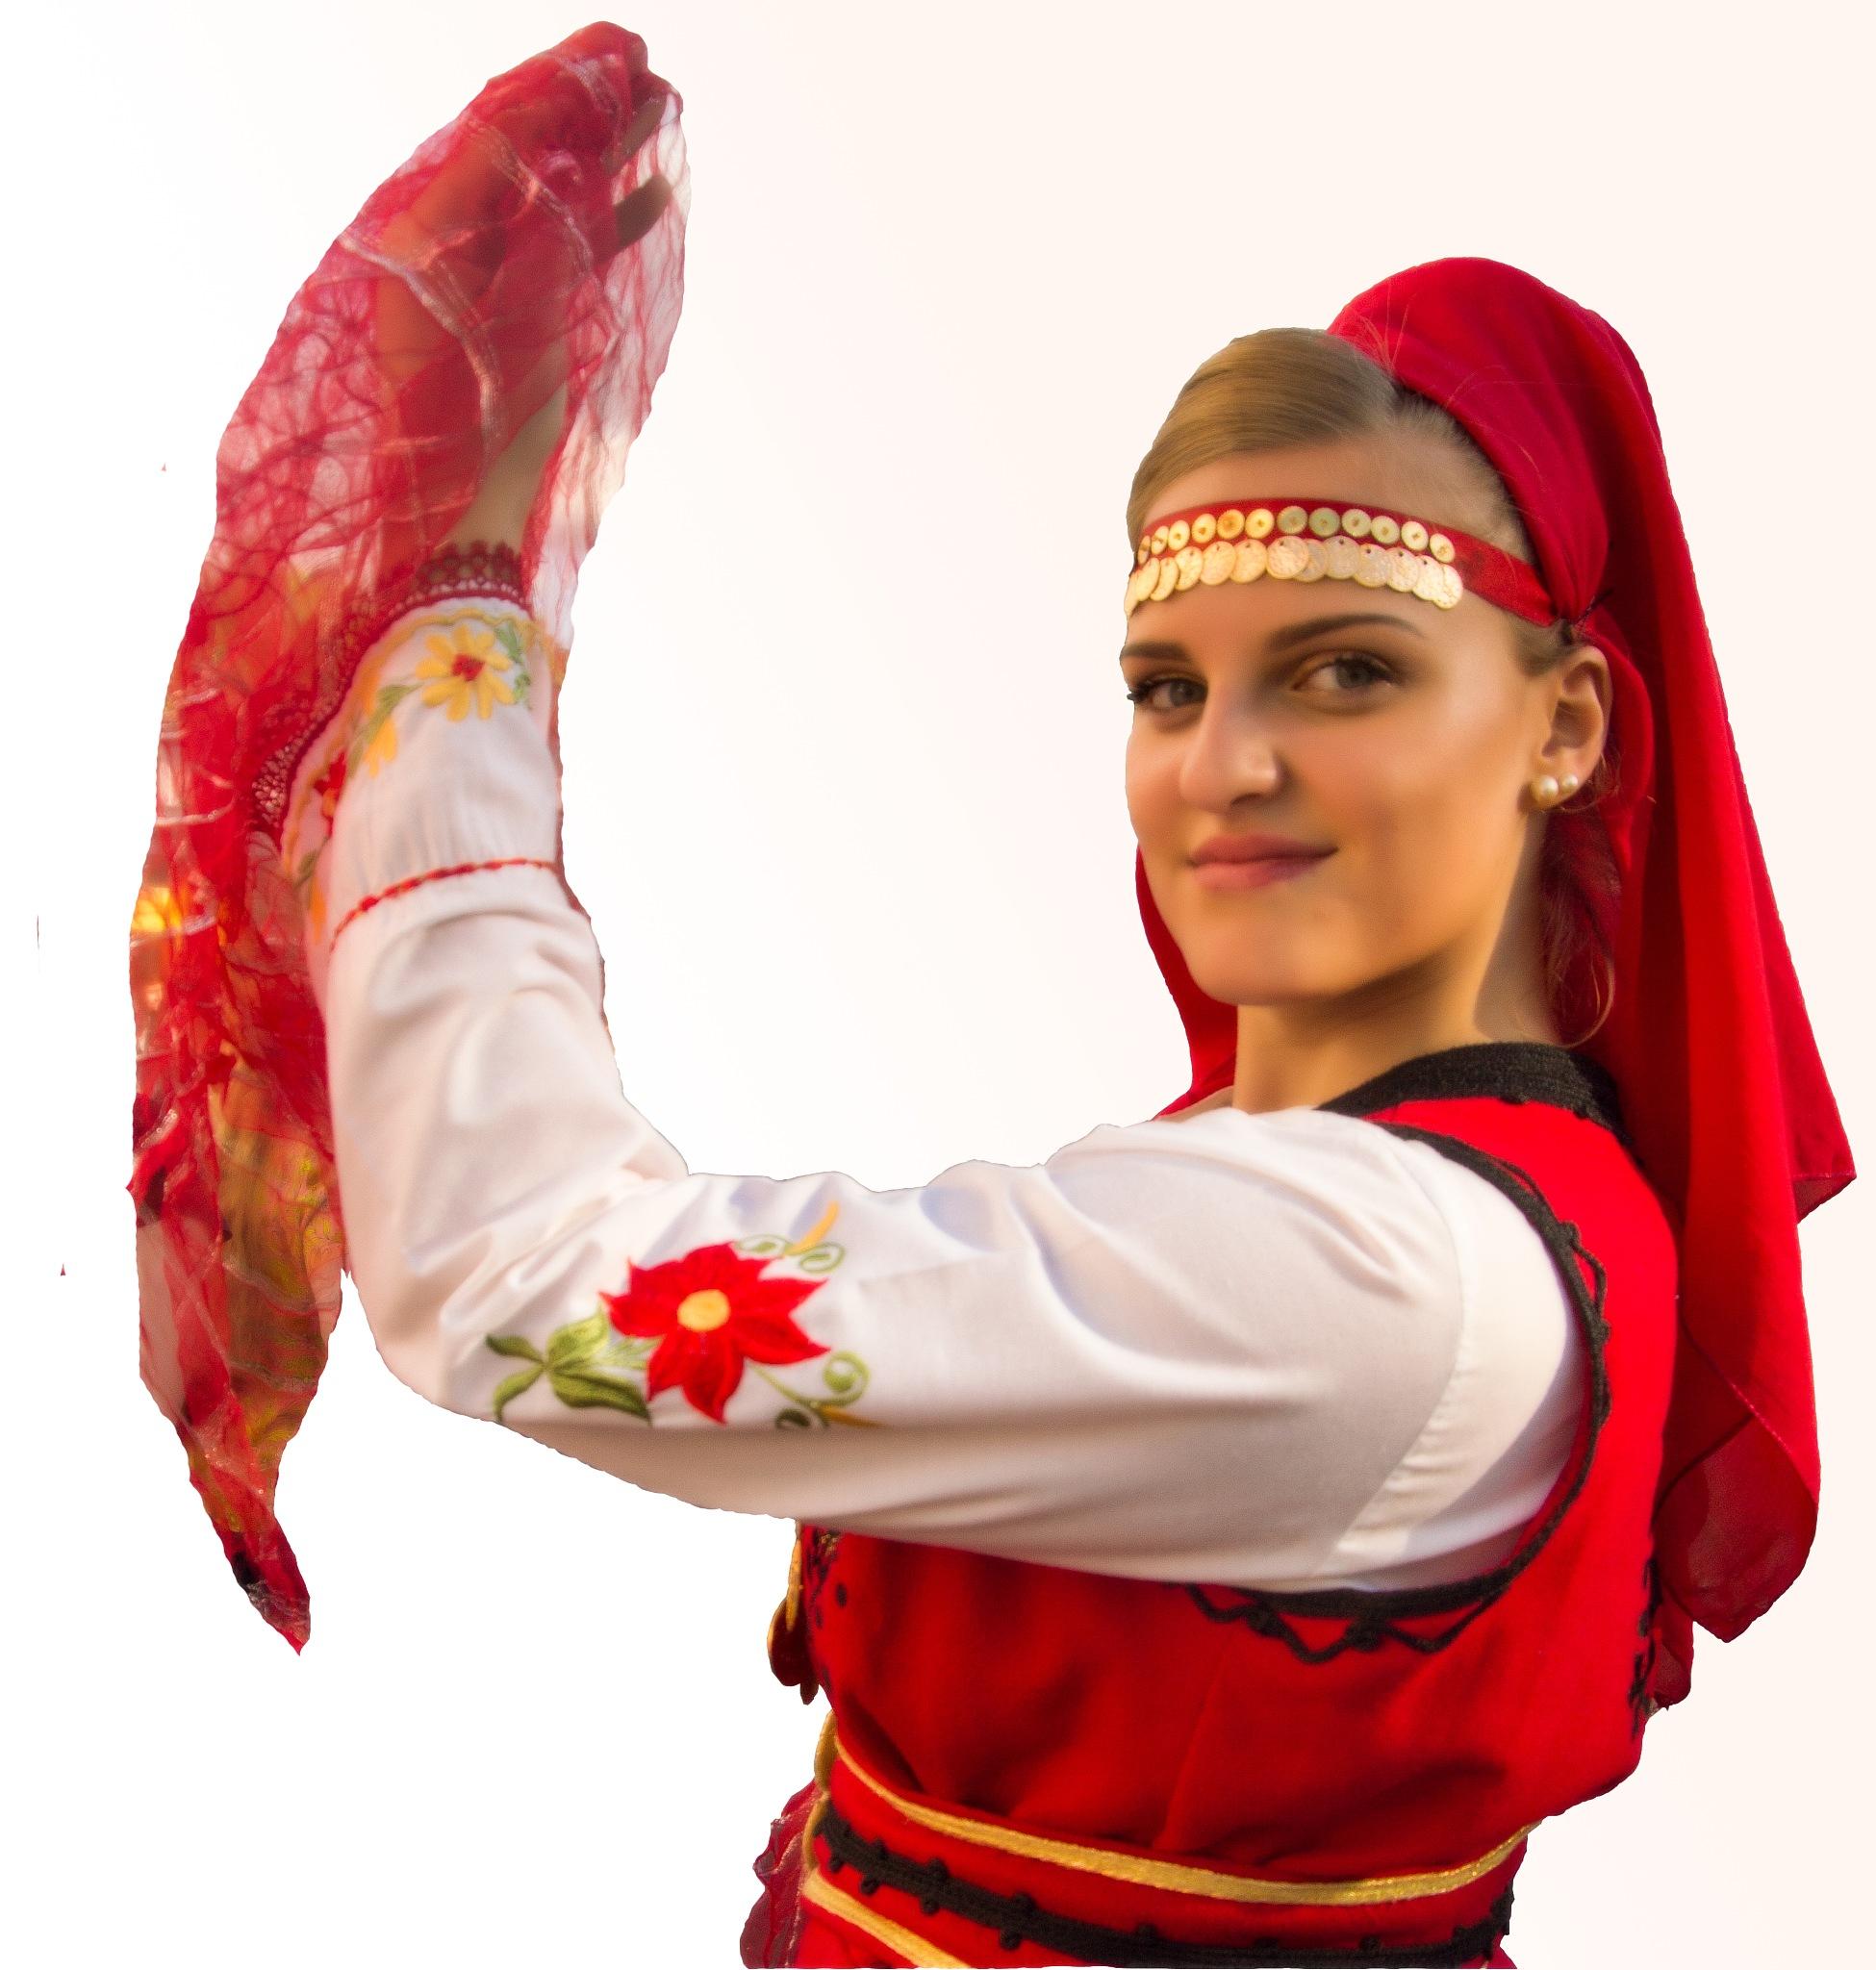 albanian girl by Mohammed ALkarawi